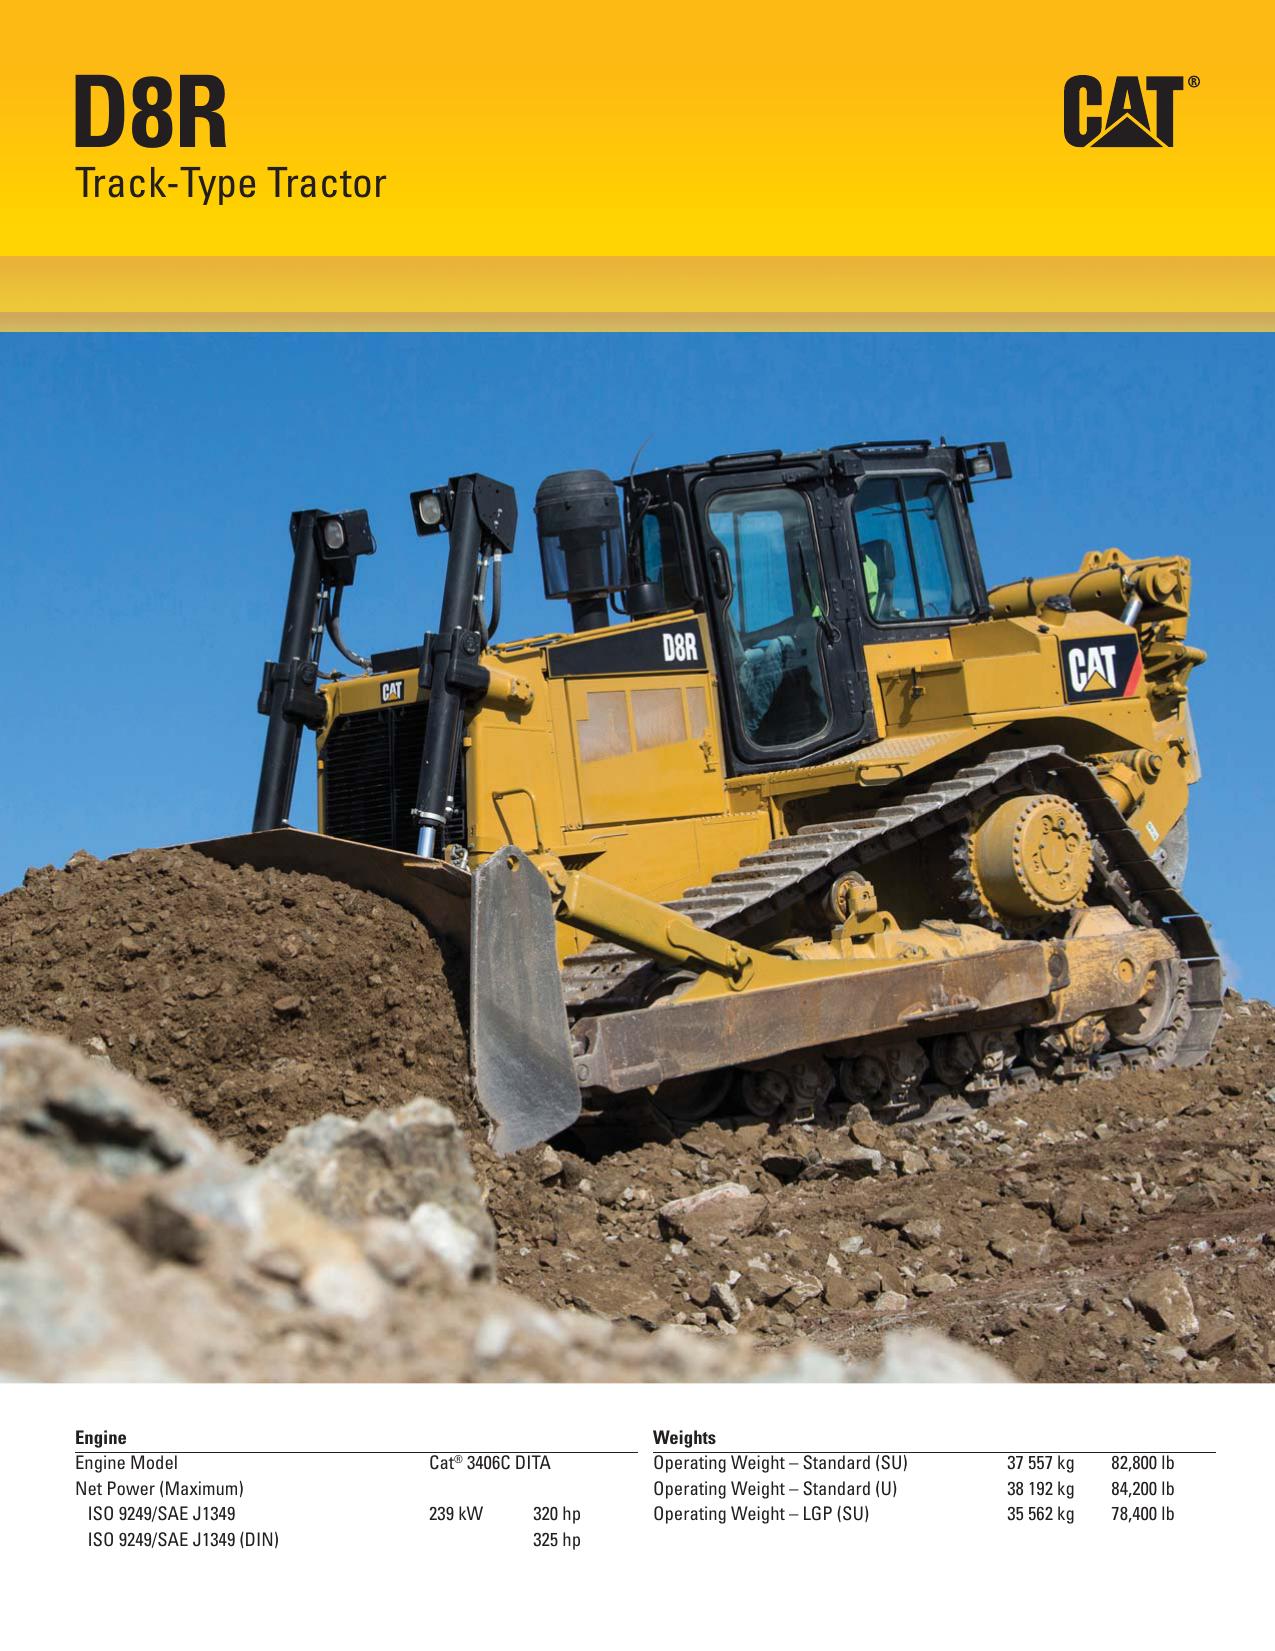 Specalog for D8R Track-Type Tractor AEHQ7378-00 | manualzz com